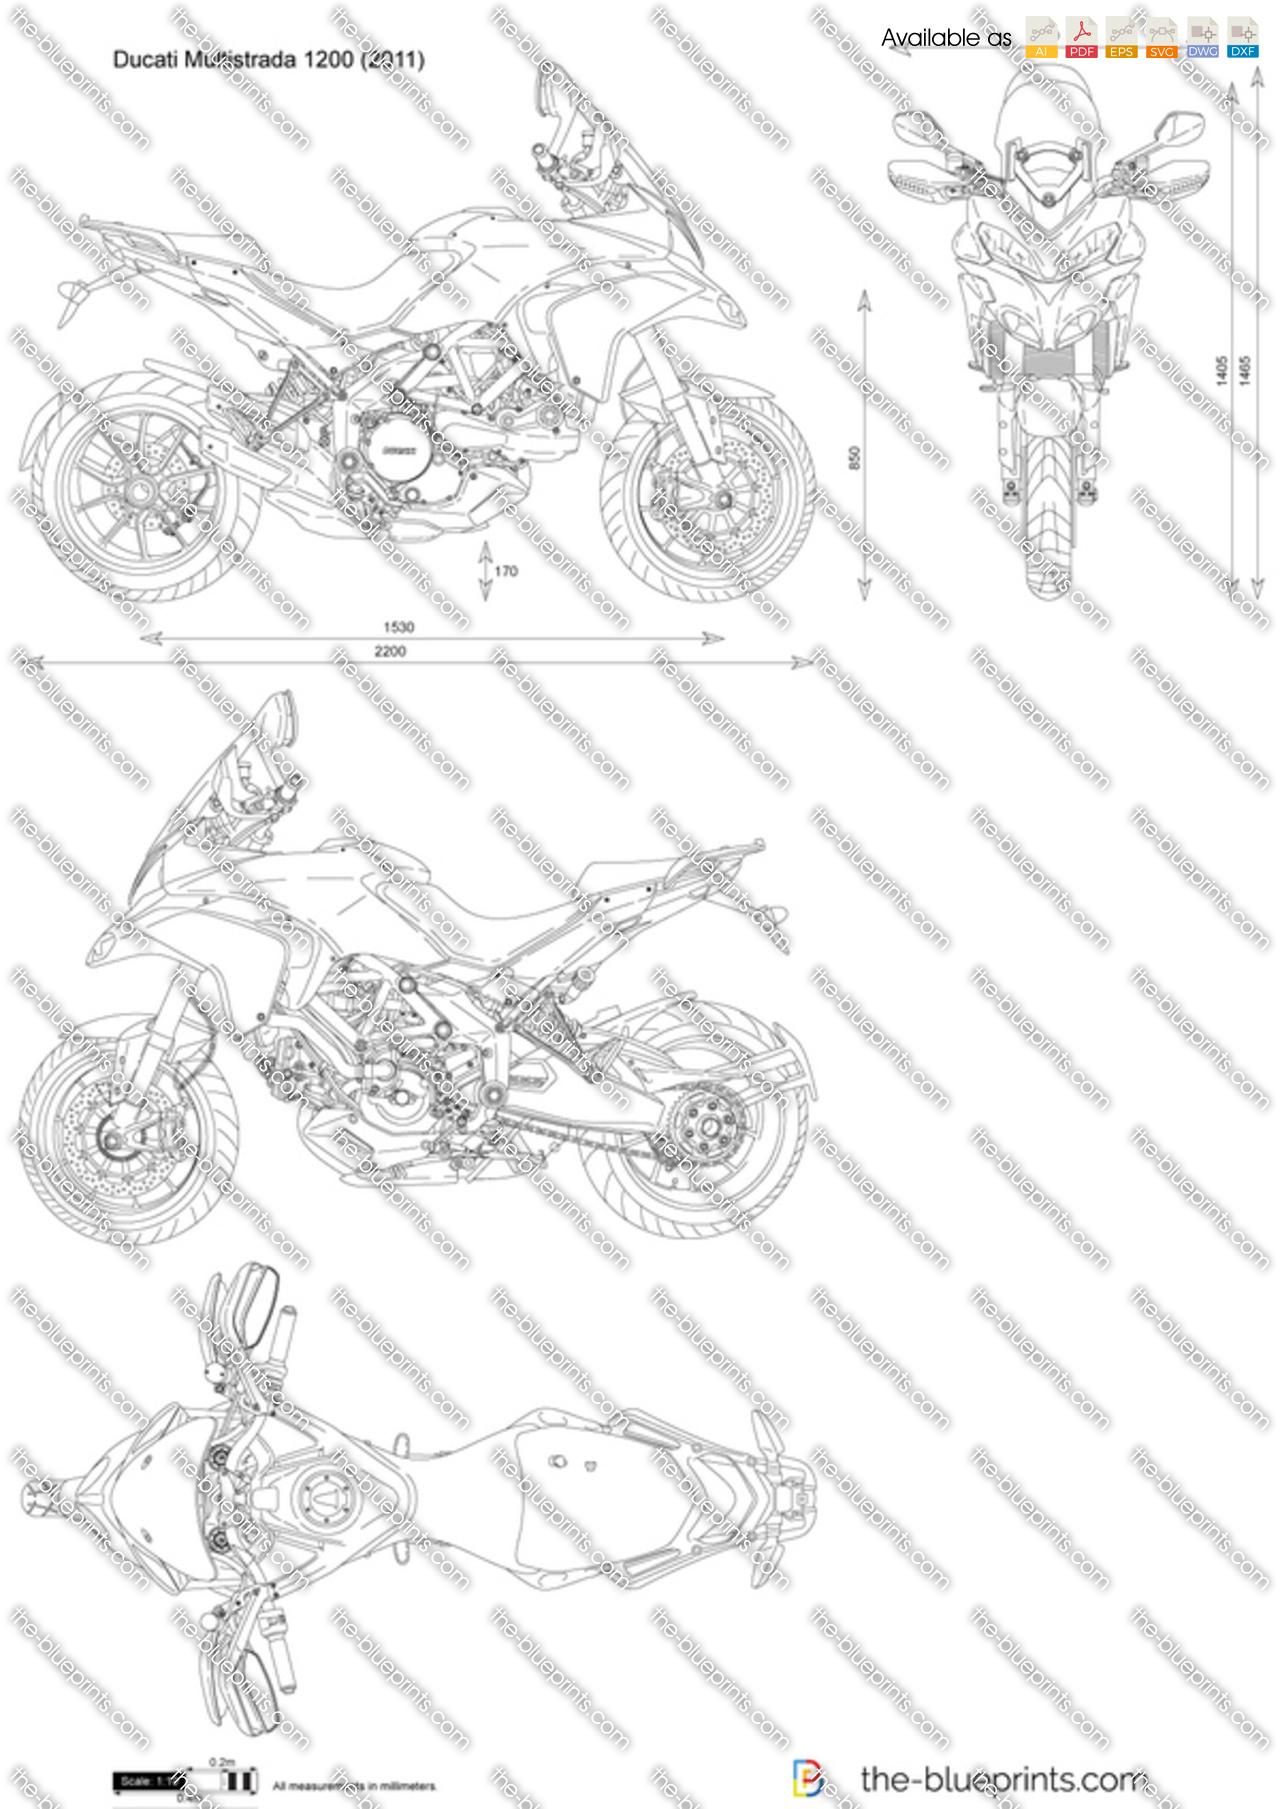 Ducati Multistrada 1200 vector drawing